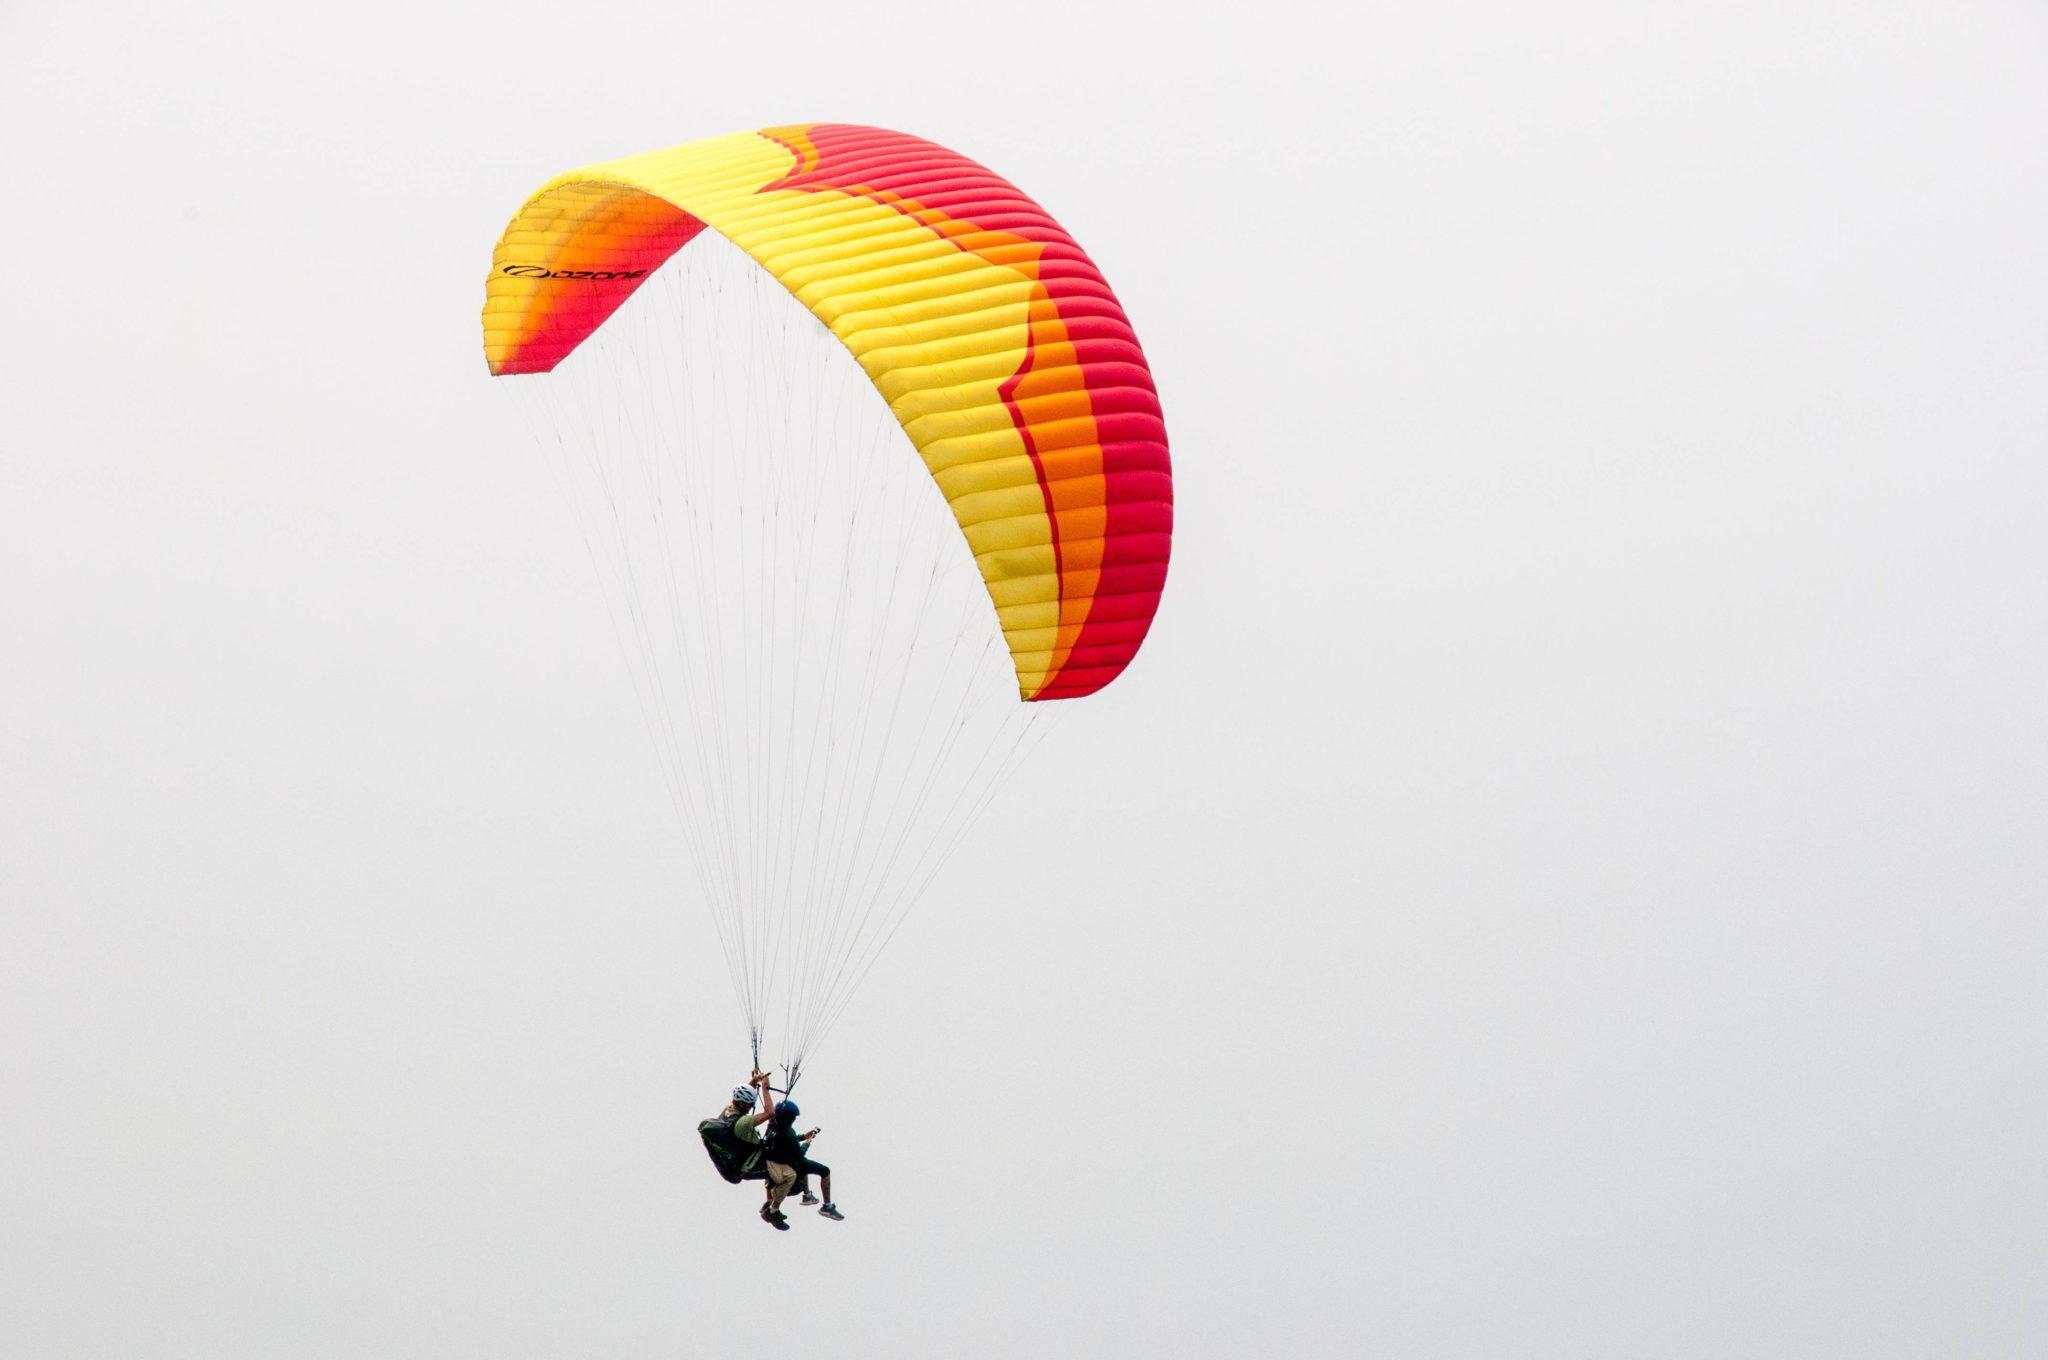 Mexico Tours – Sea to Sky Paragliding